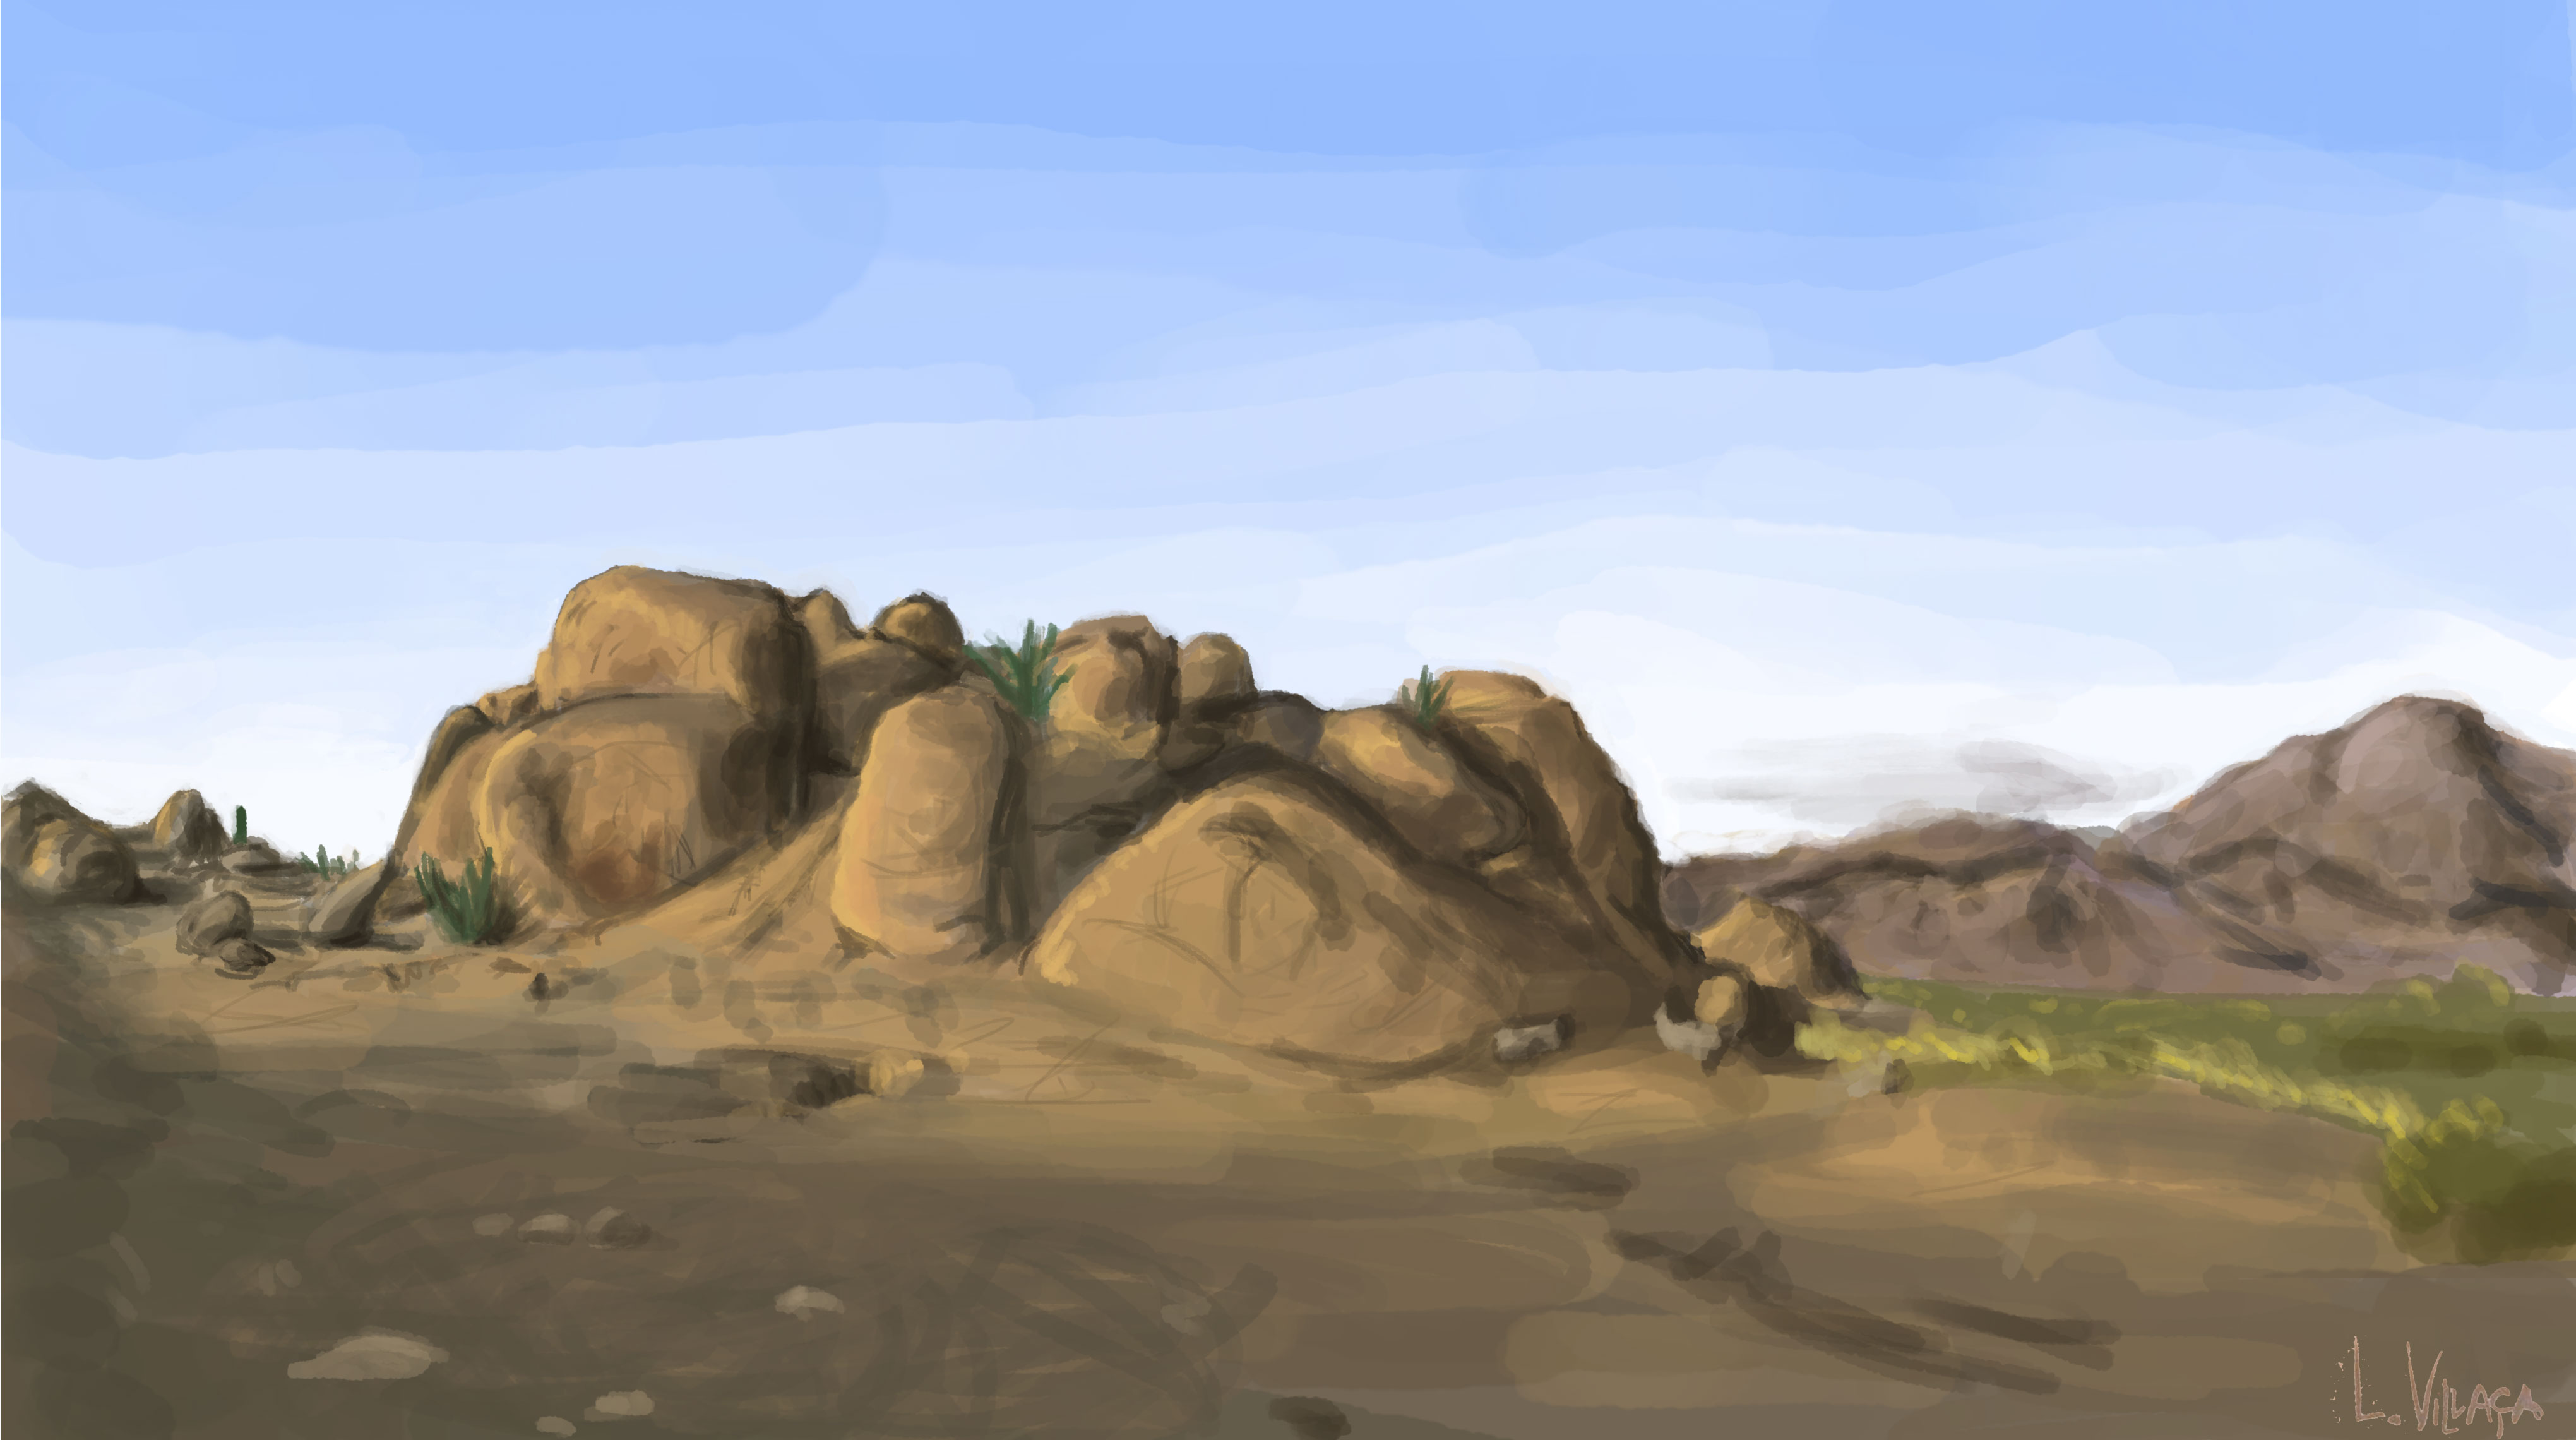 Parool rocks